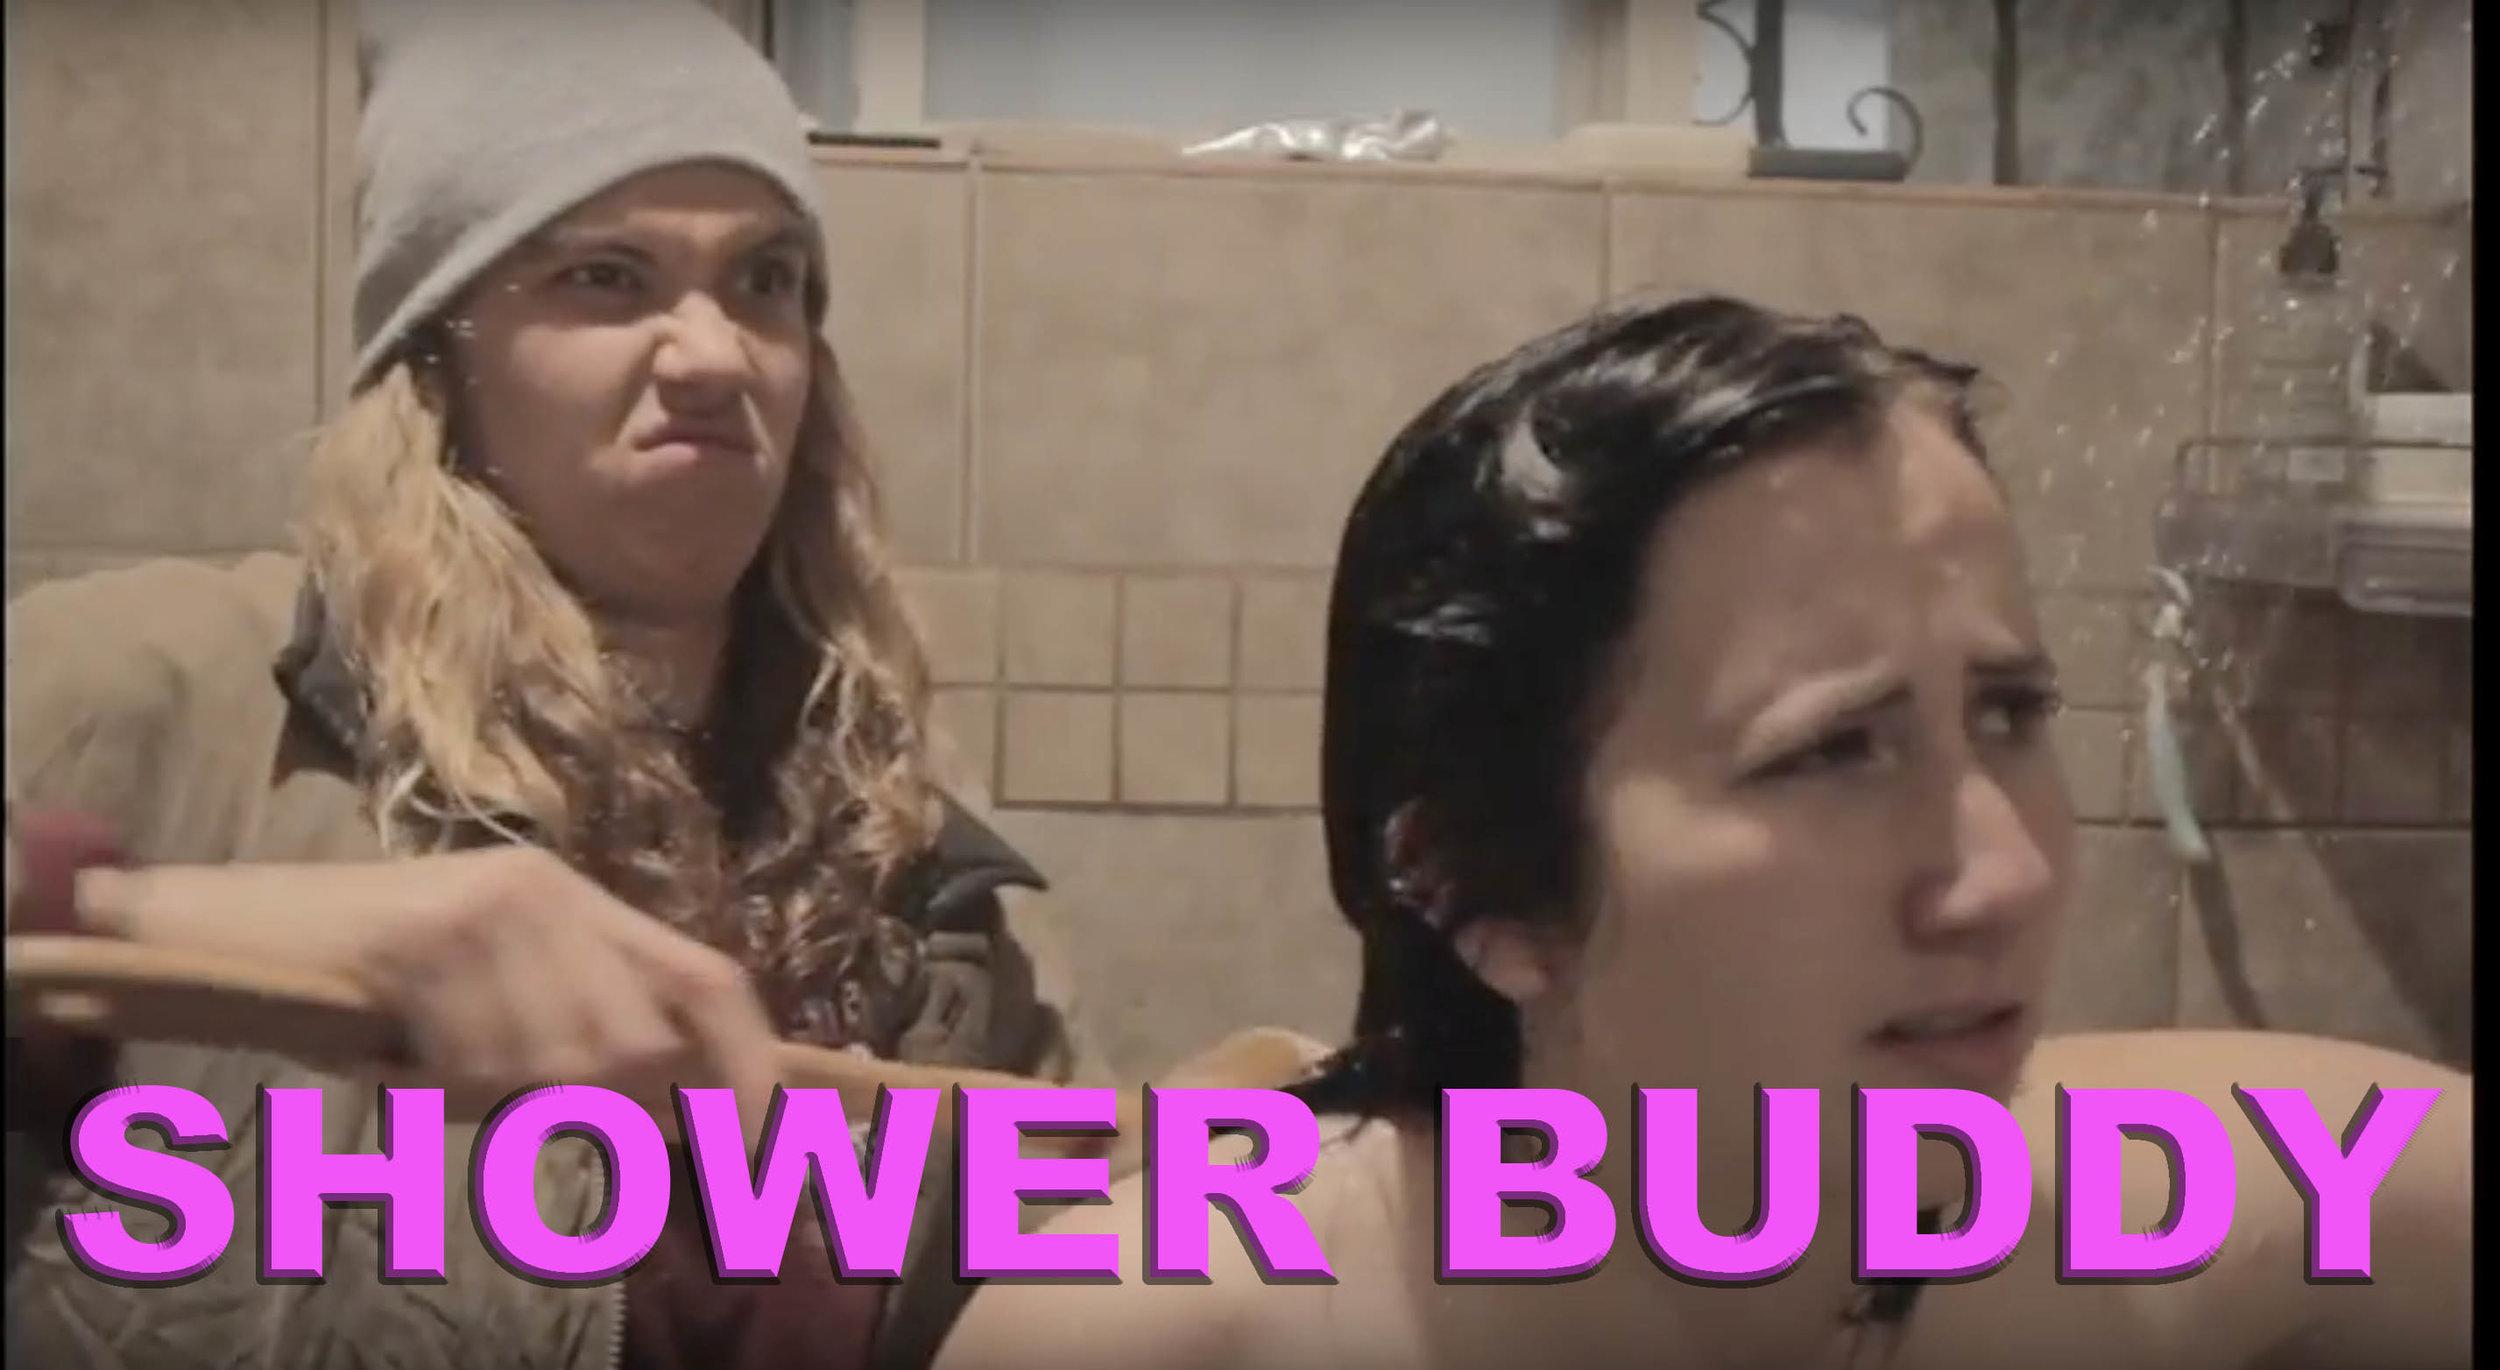 Shower Buddy Thumbnail.jpg